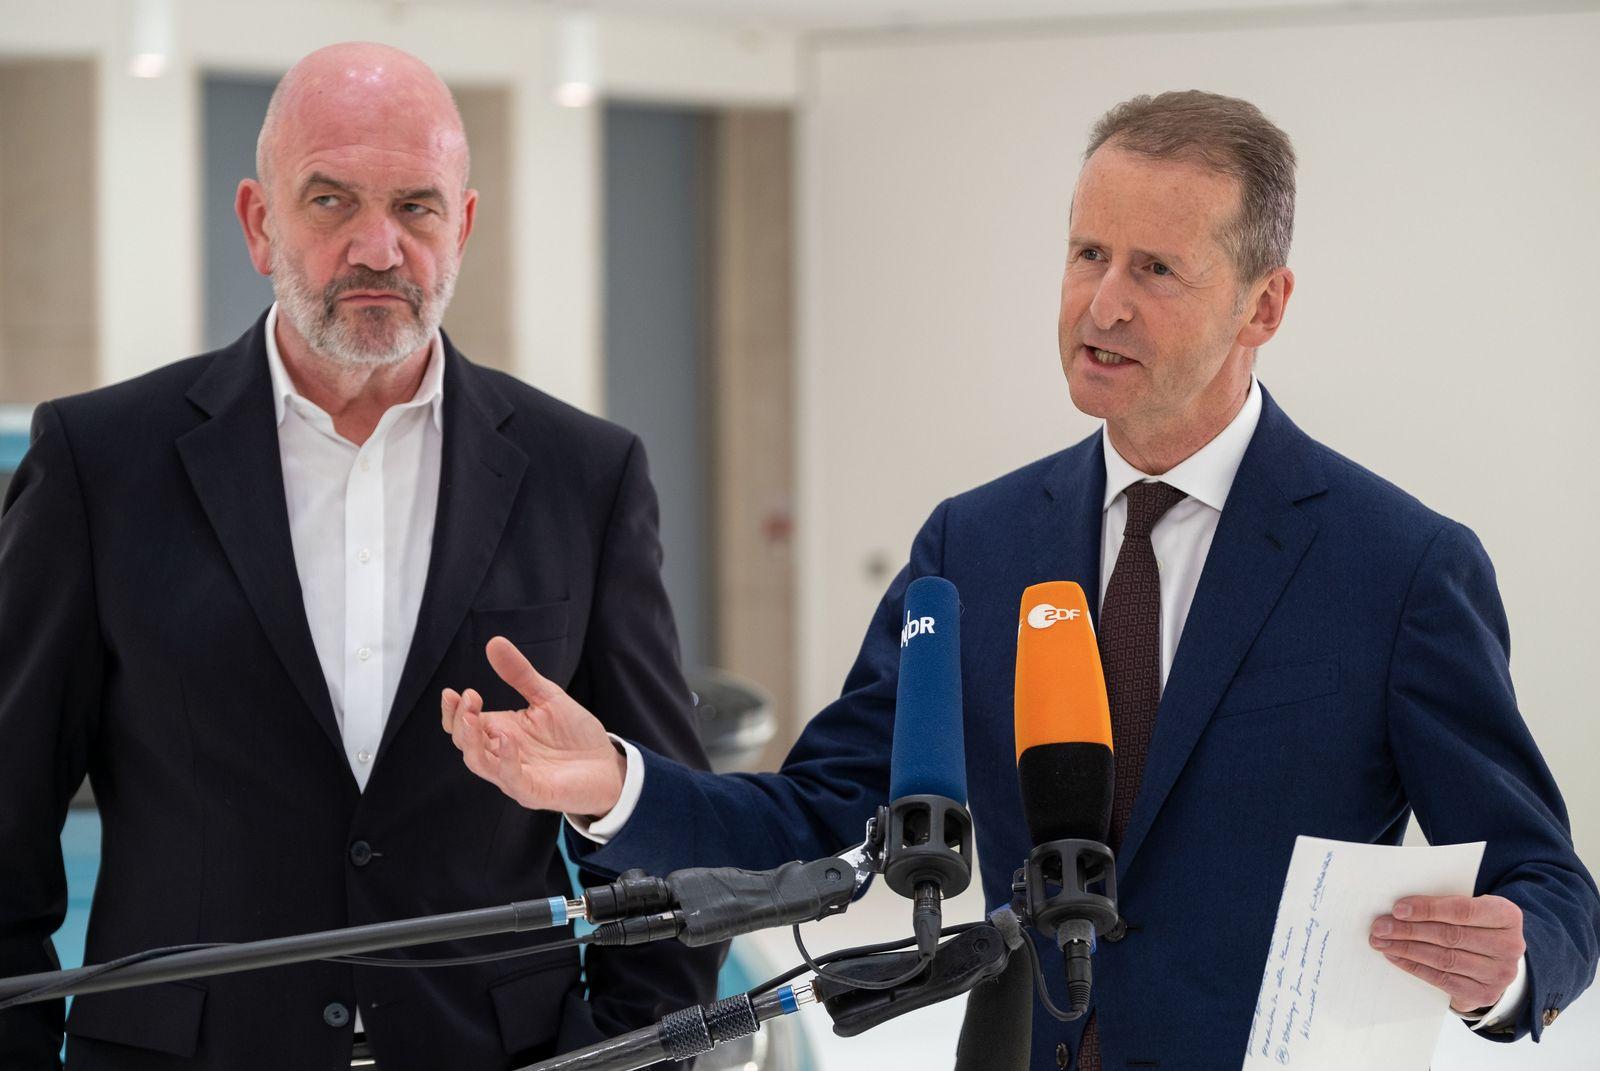 Bernd Osterloh / Herbert Diess